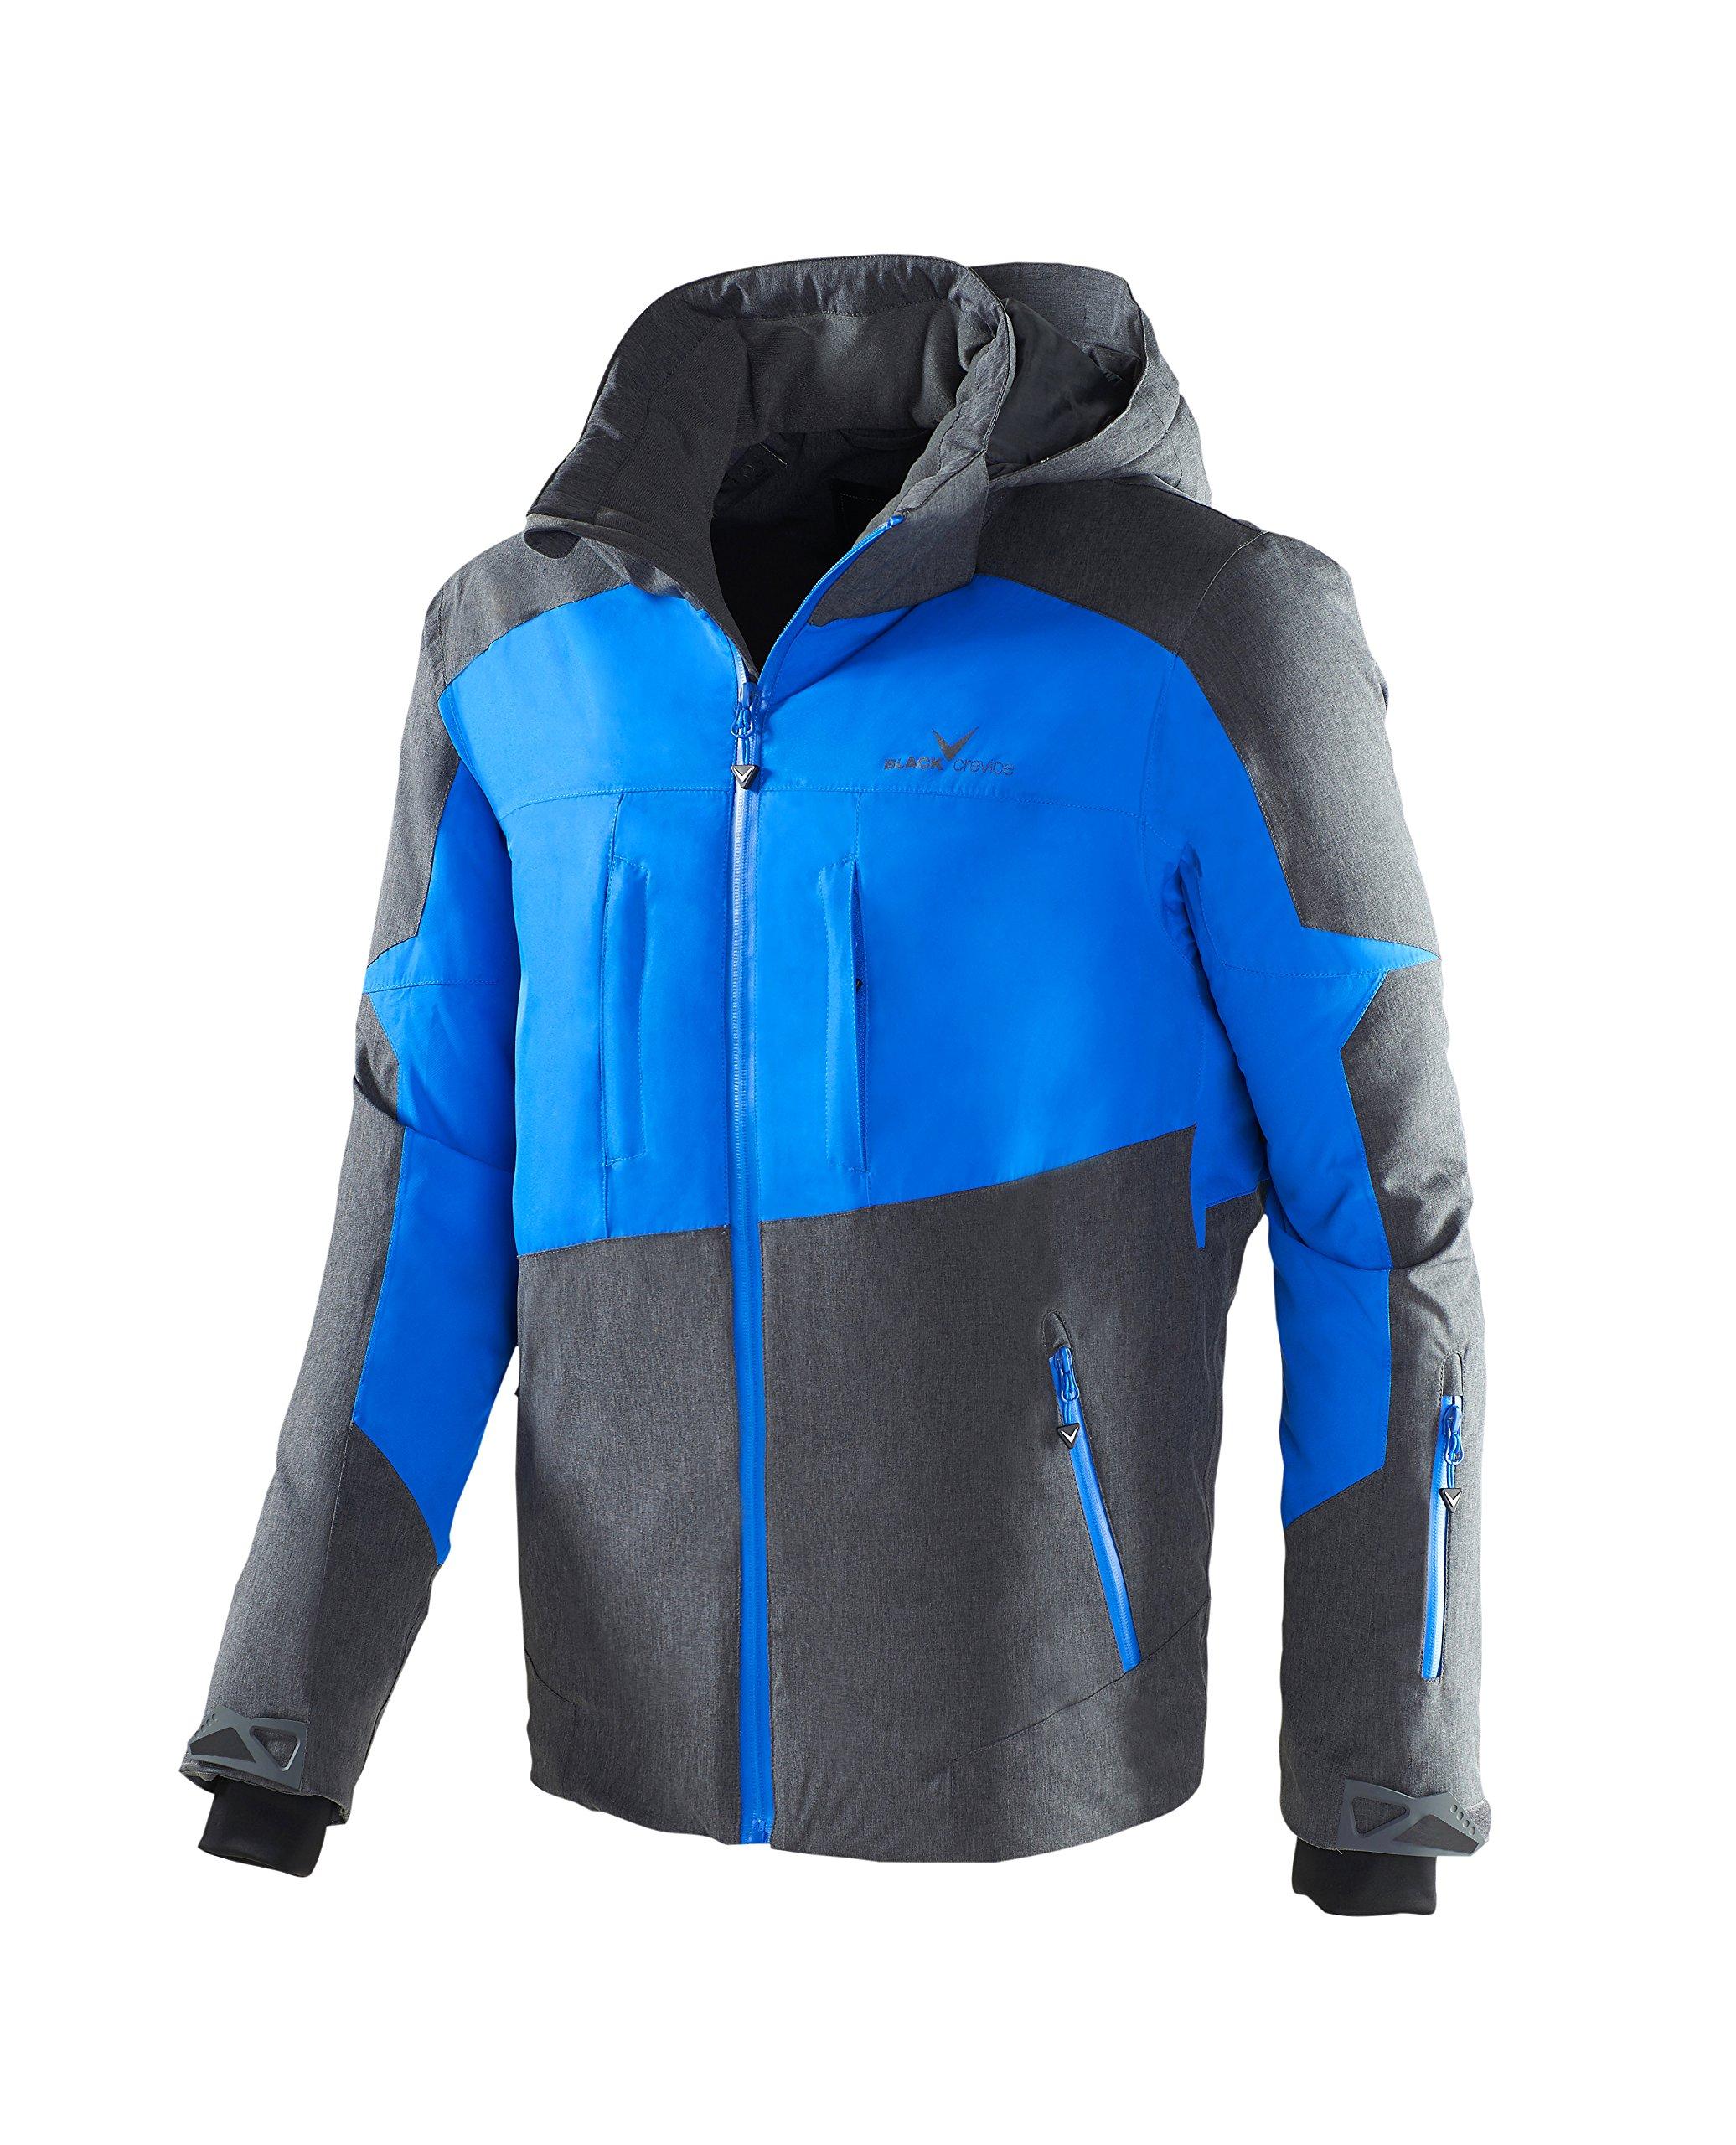 Black Crevice Herren Ski- und Snowboardjacke, BCR251004, mehrfarbig (grau/blau),